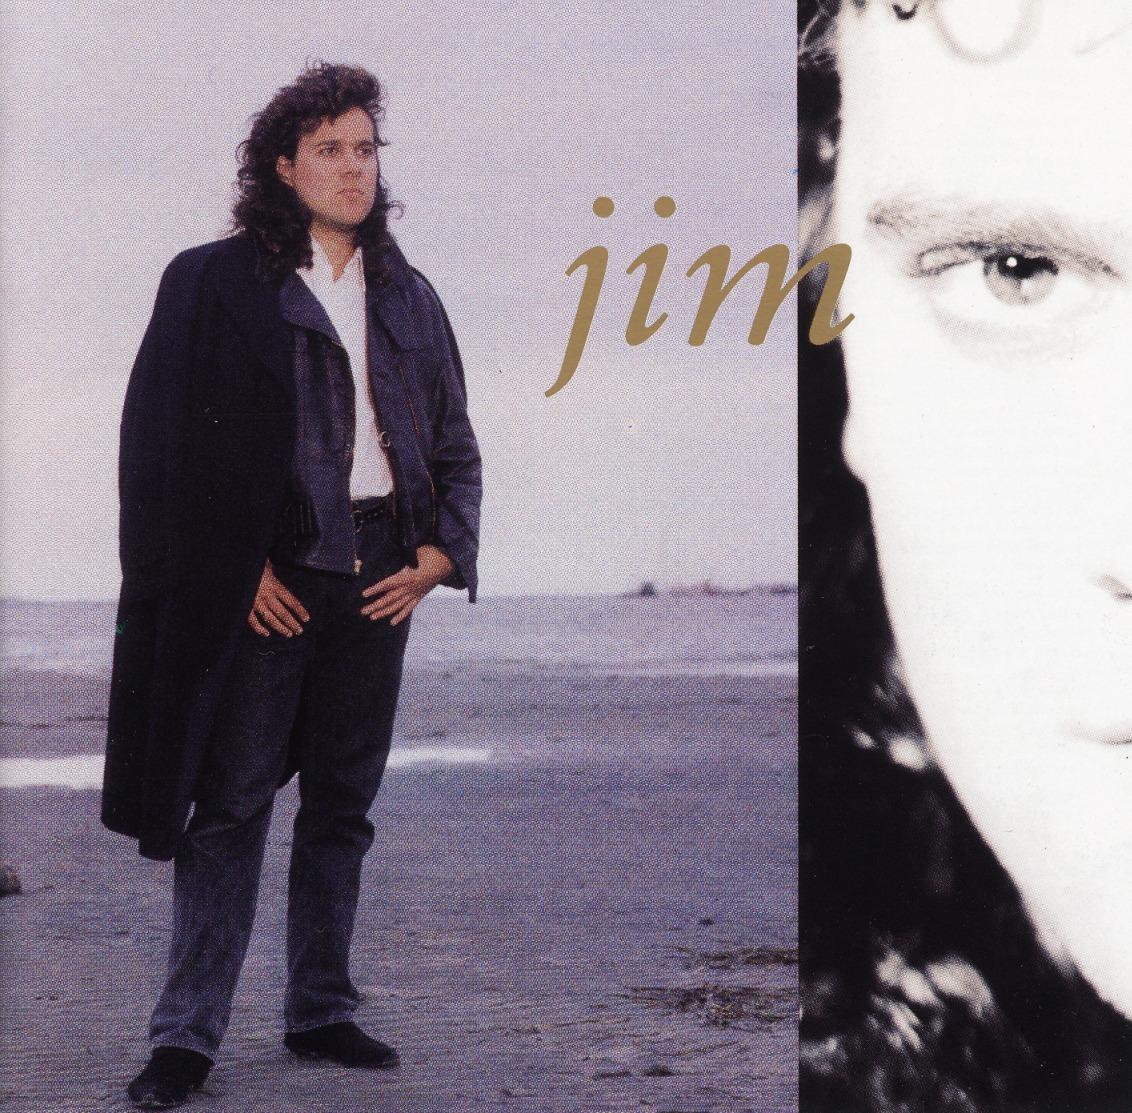 JIM JIDHED (Sweden) / Jim + 4